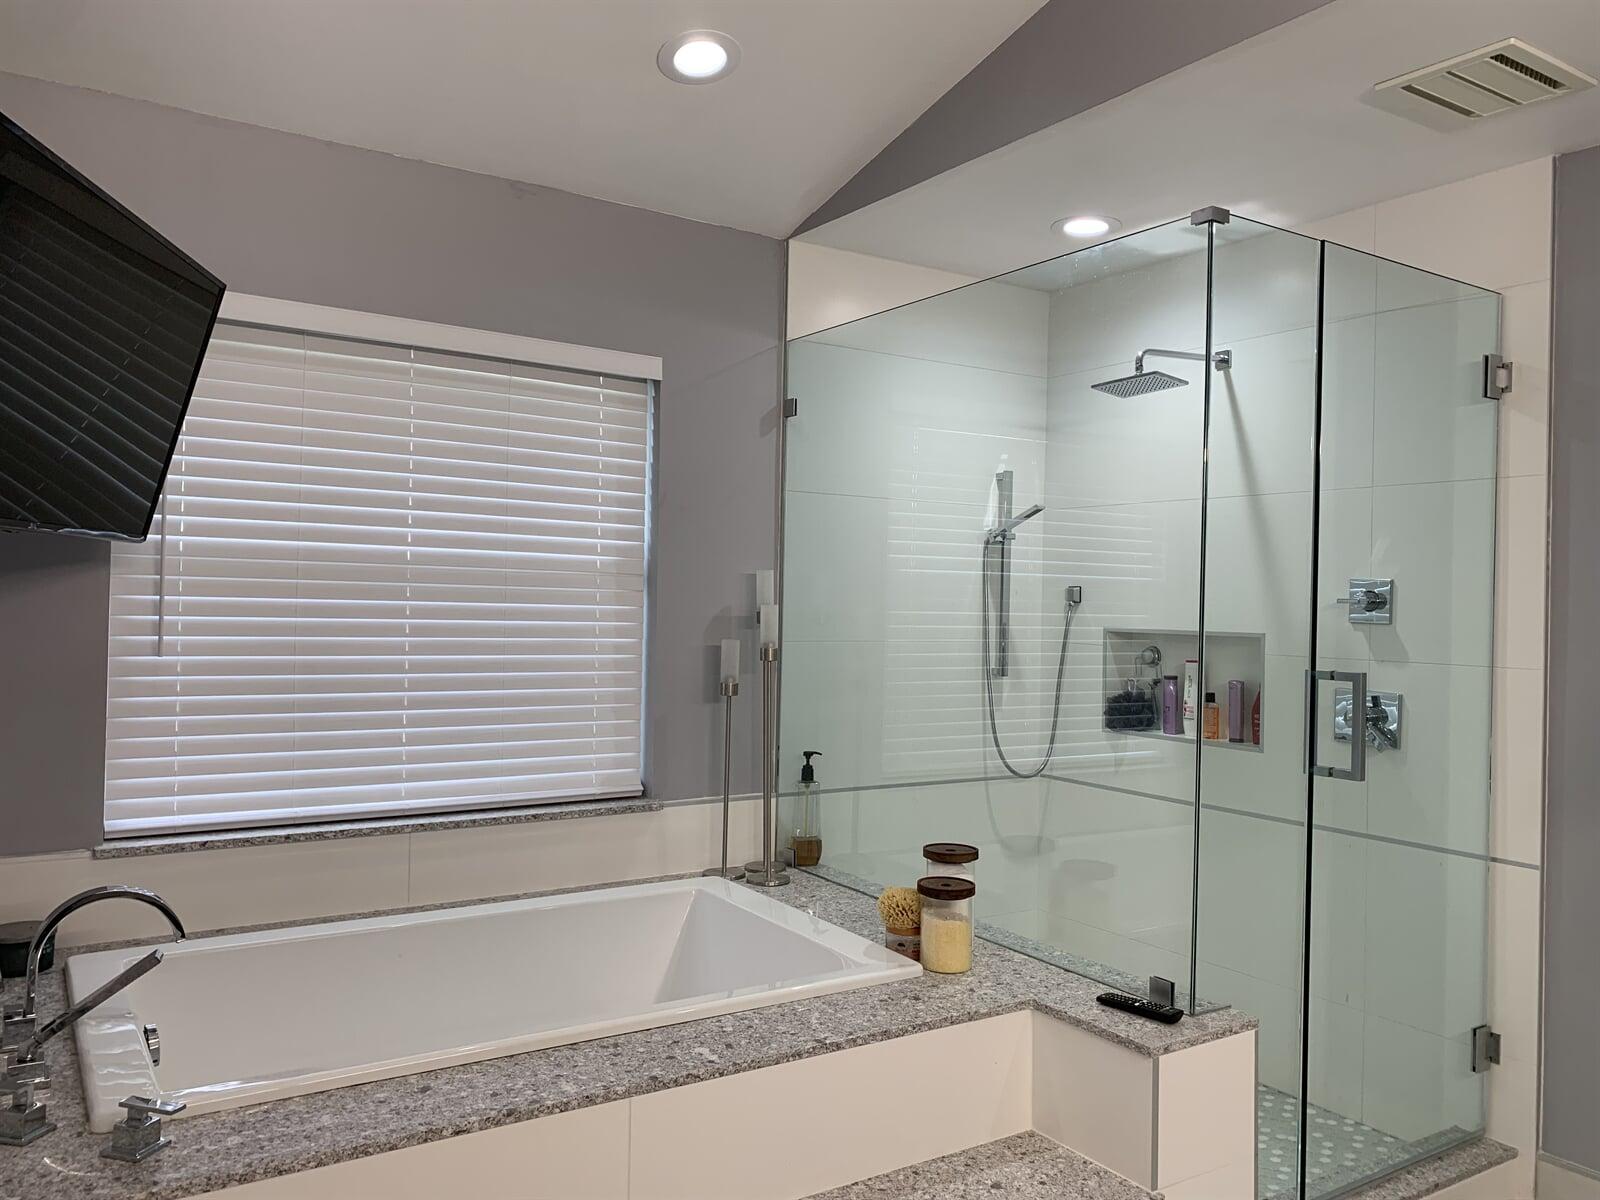 Bathrooms in Siesta Key, FL by Floors and Walls of Distinction